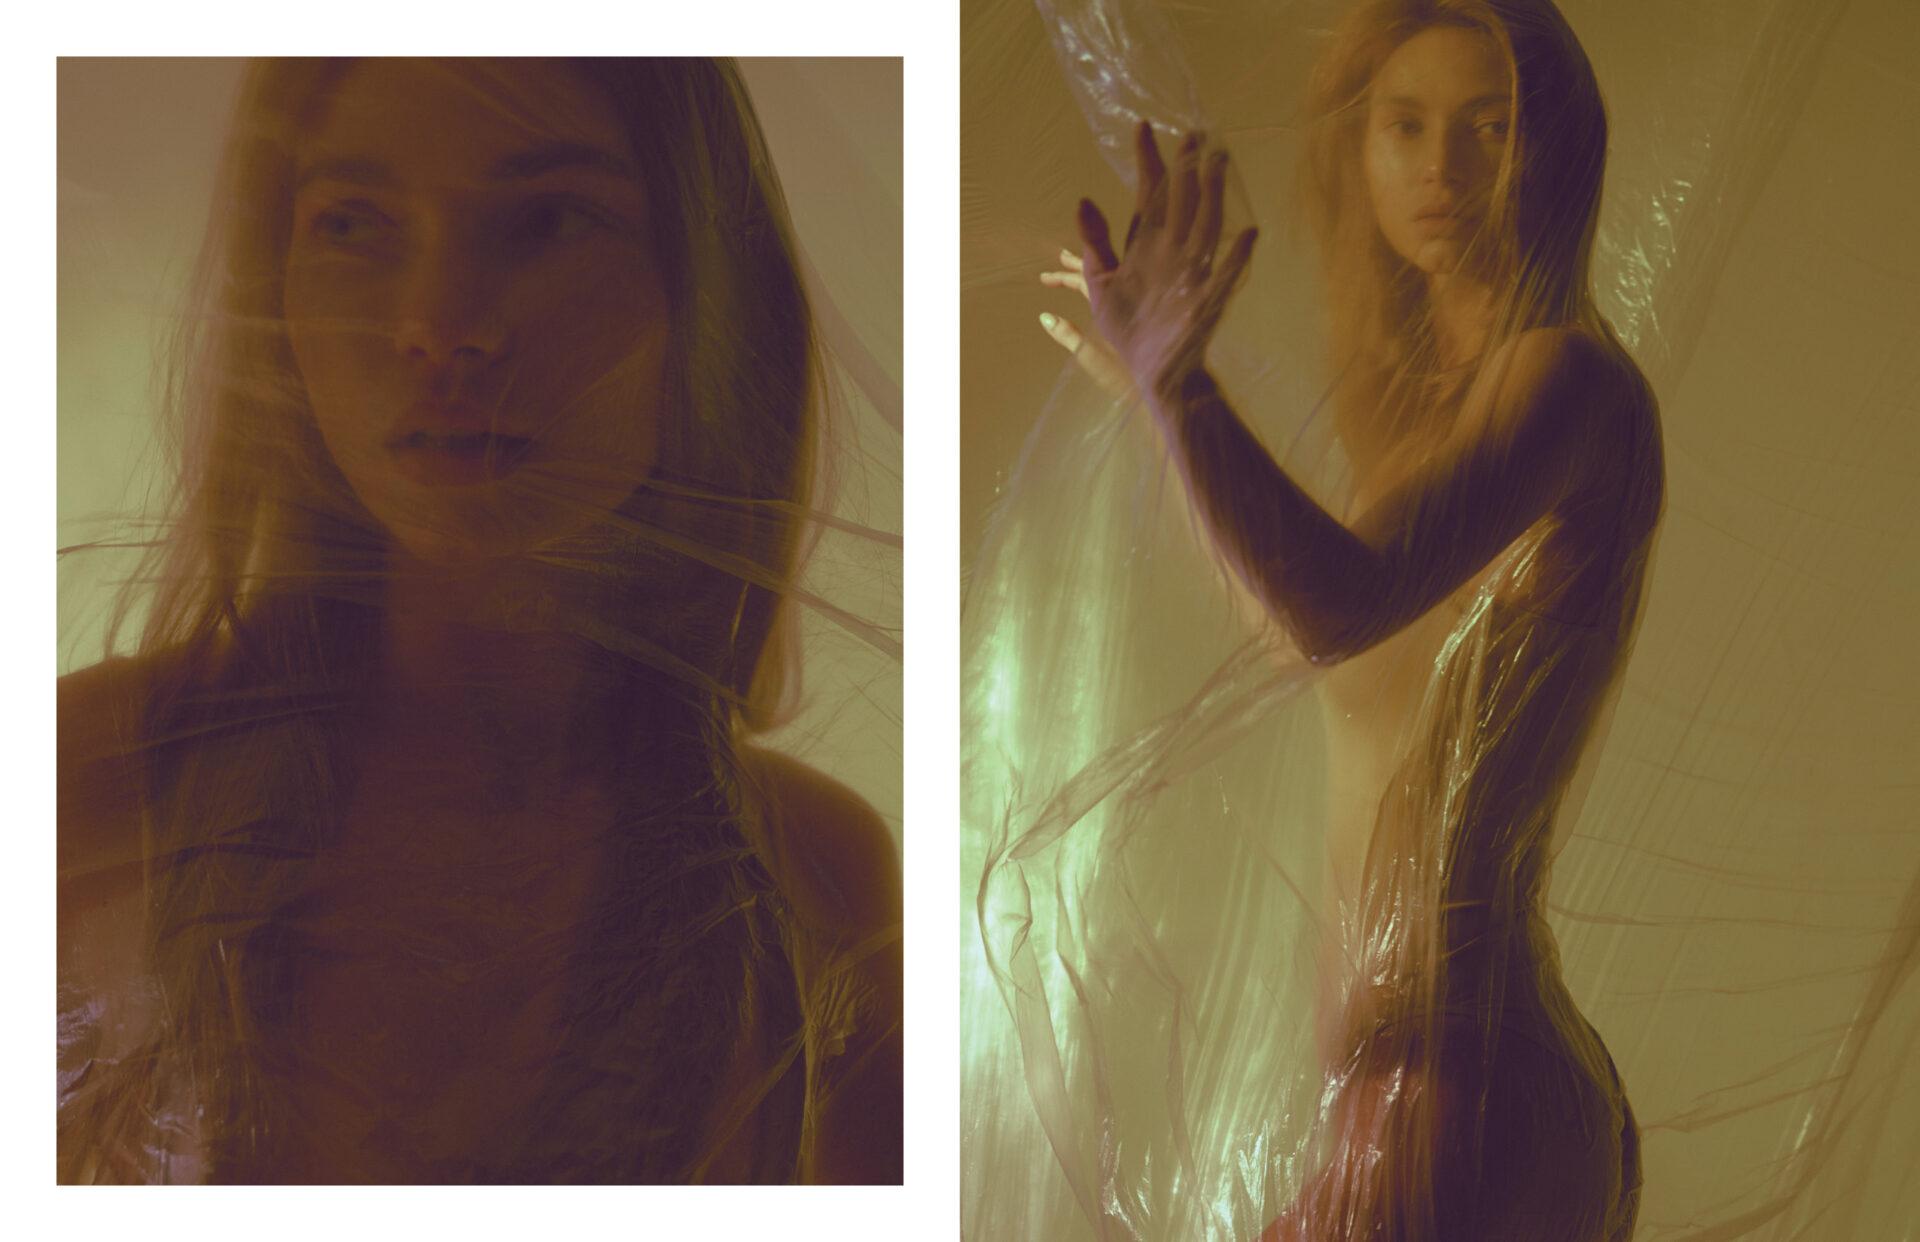 "Editorial ""Colors"" by Medana Marchenko with Uliana Belova. Make up by Anna Suri. Styling by Nadya Yakovleva for KEYI MAGAZINE"